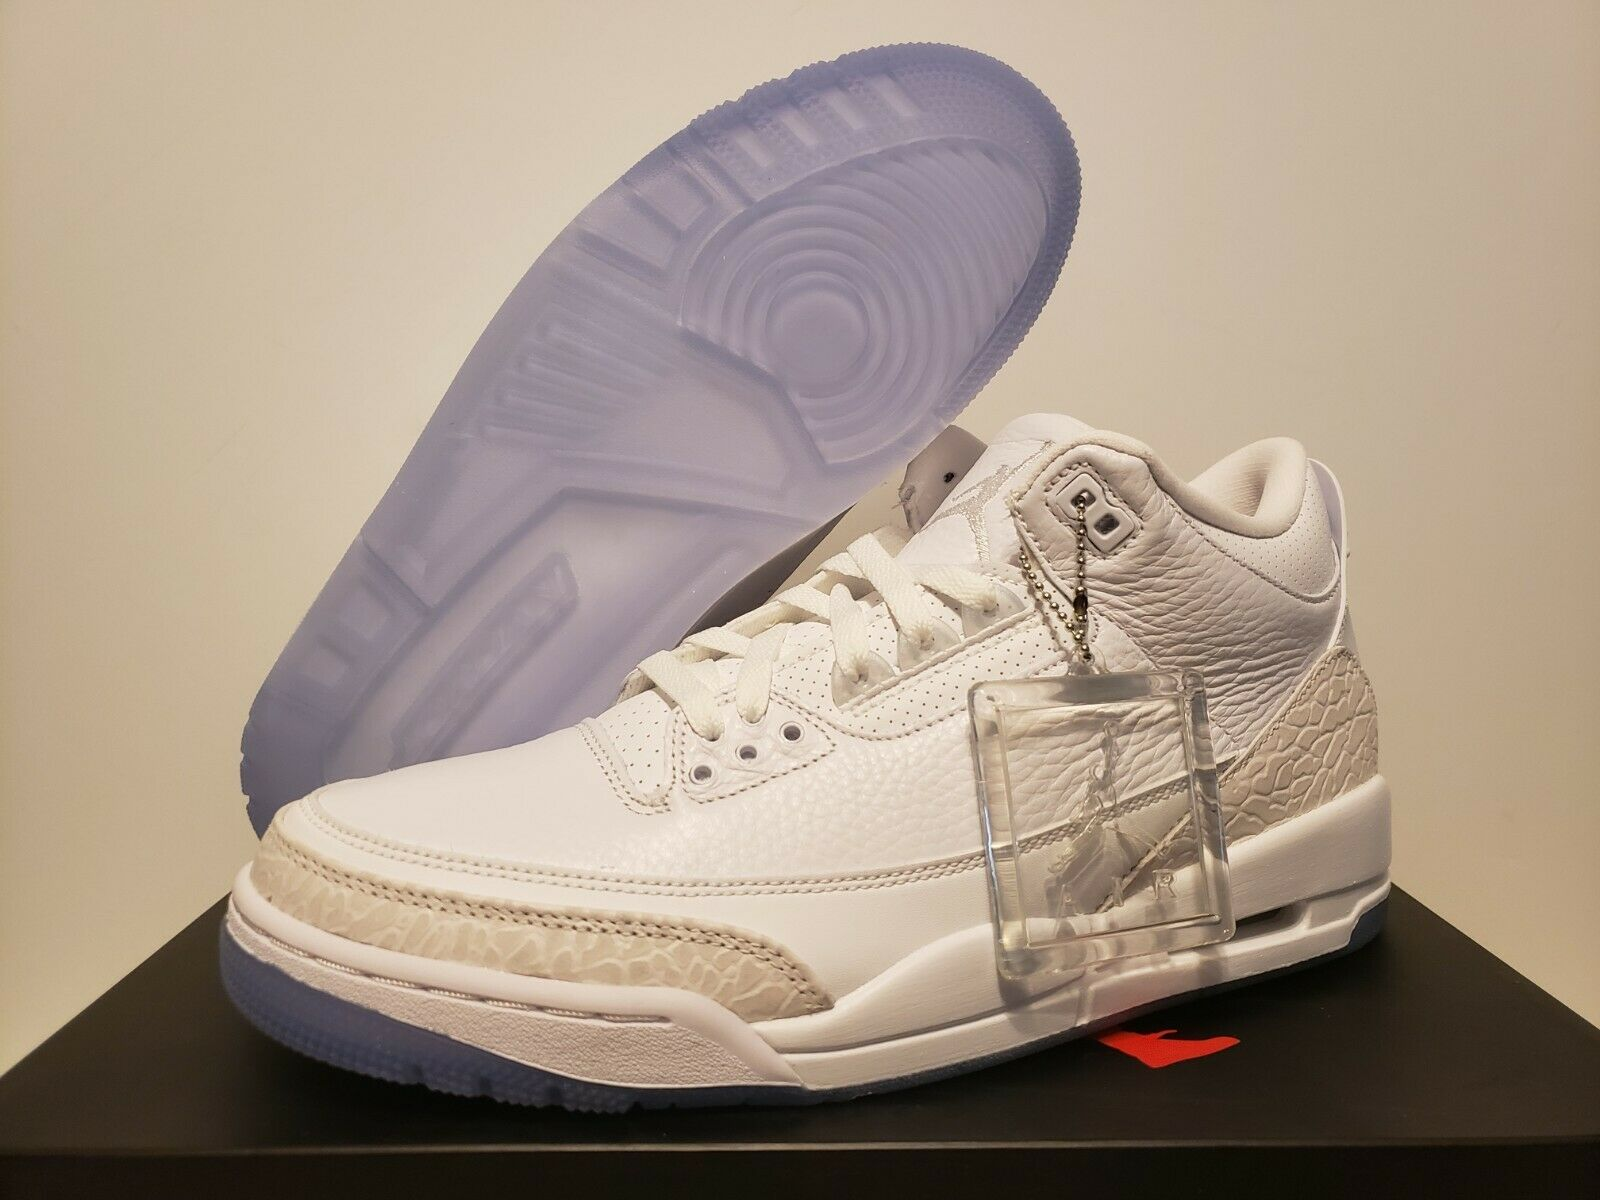 DS Jordan 3 Retro TRIPLE blancoo Air